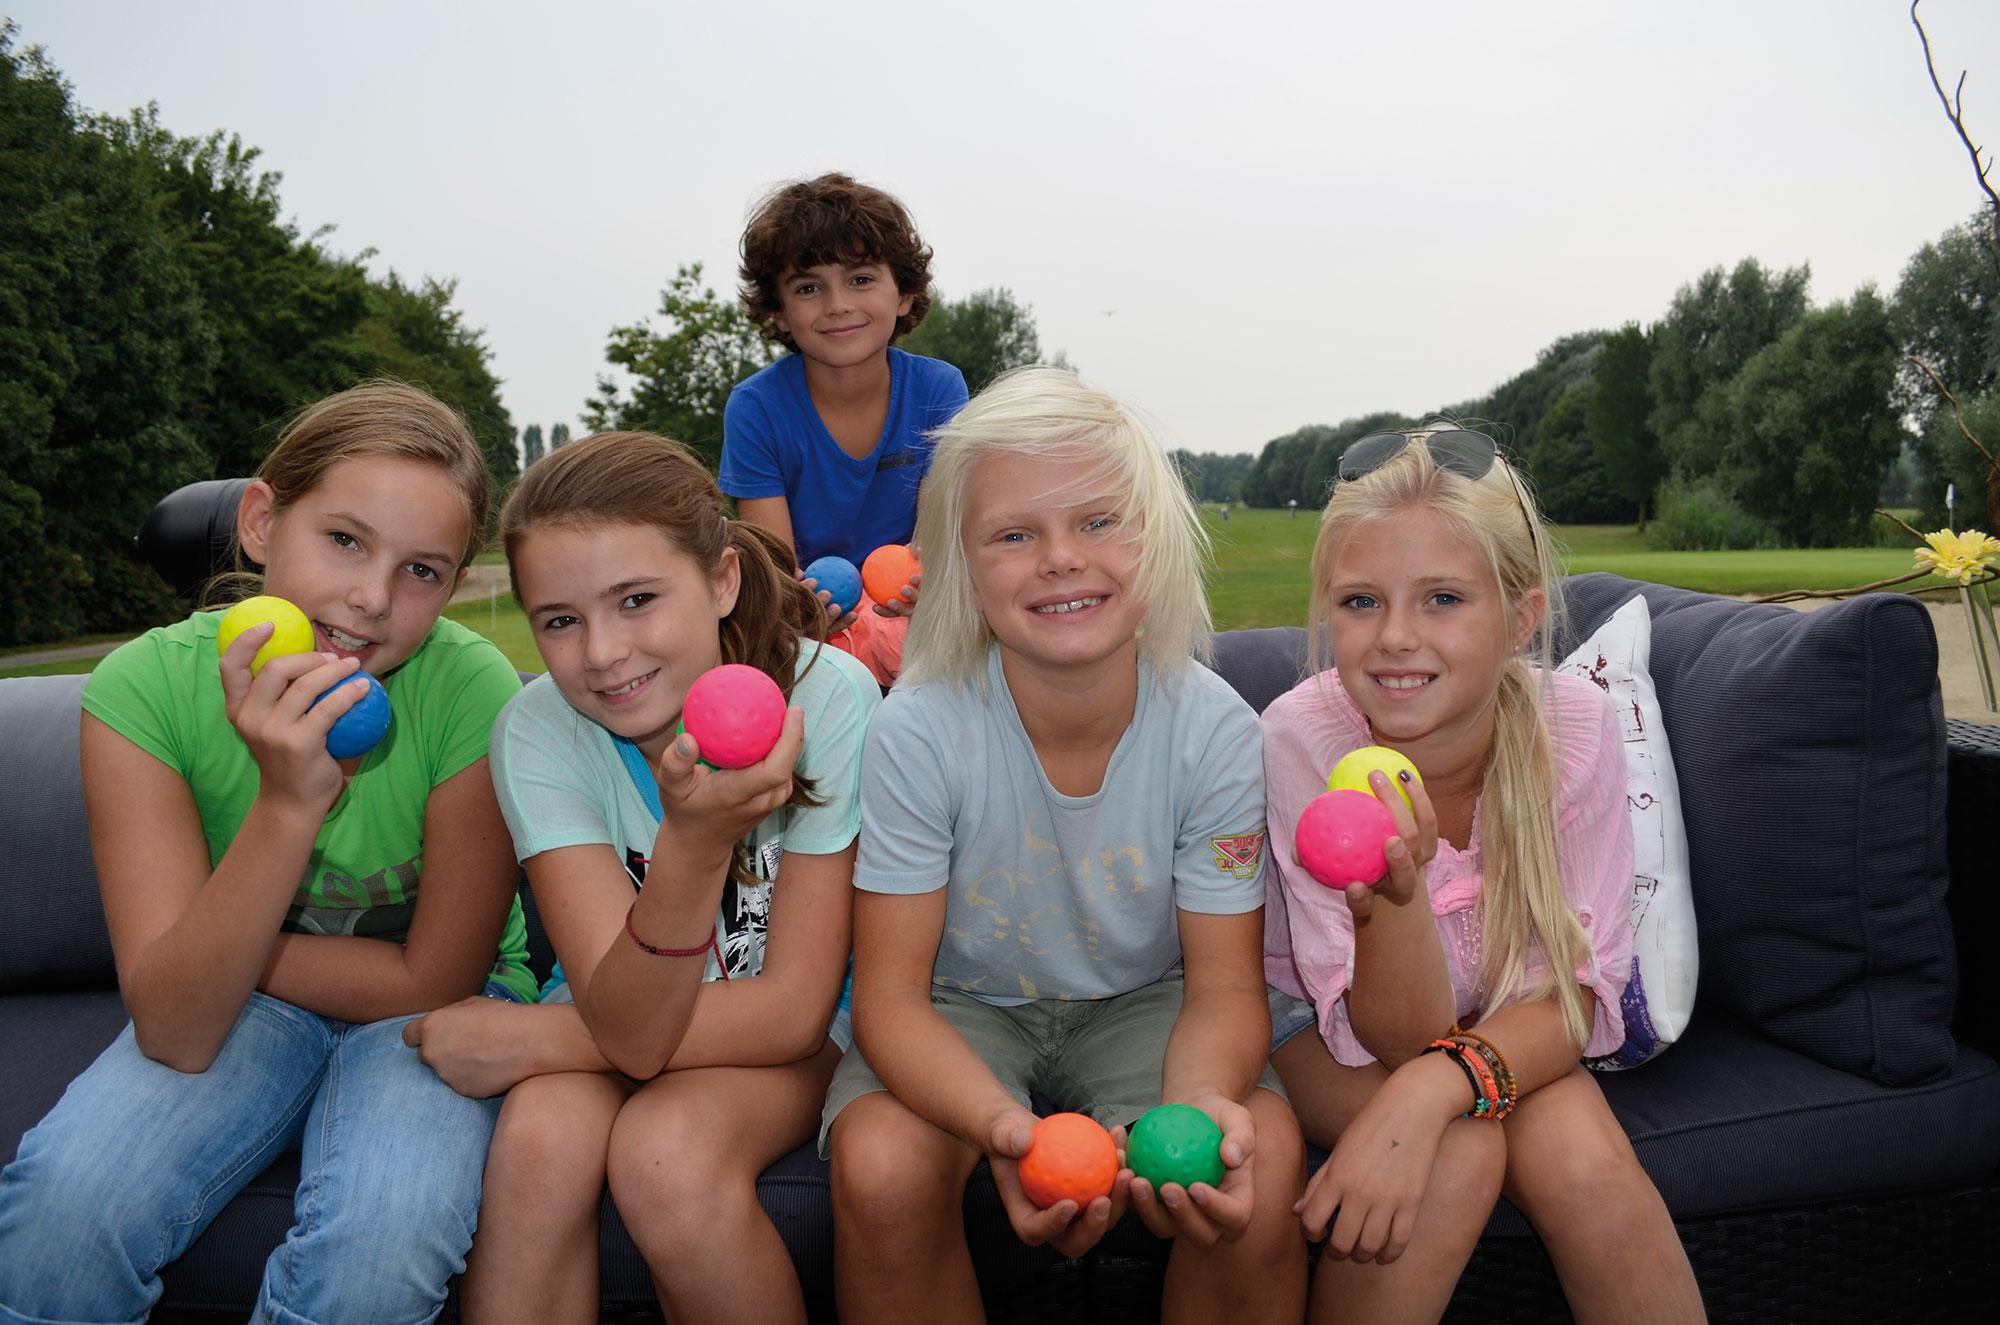 sportief kinderfeestje op de golfbaan - Supagolf